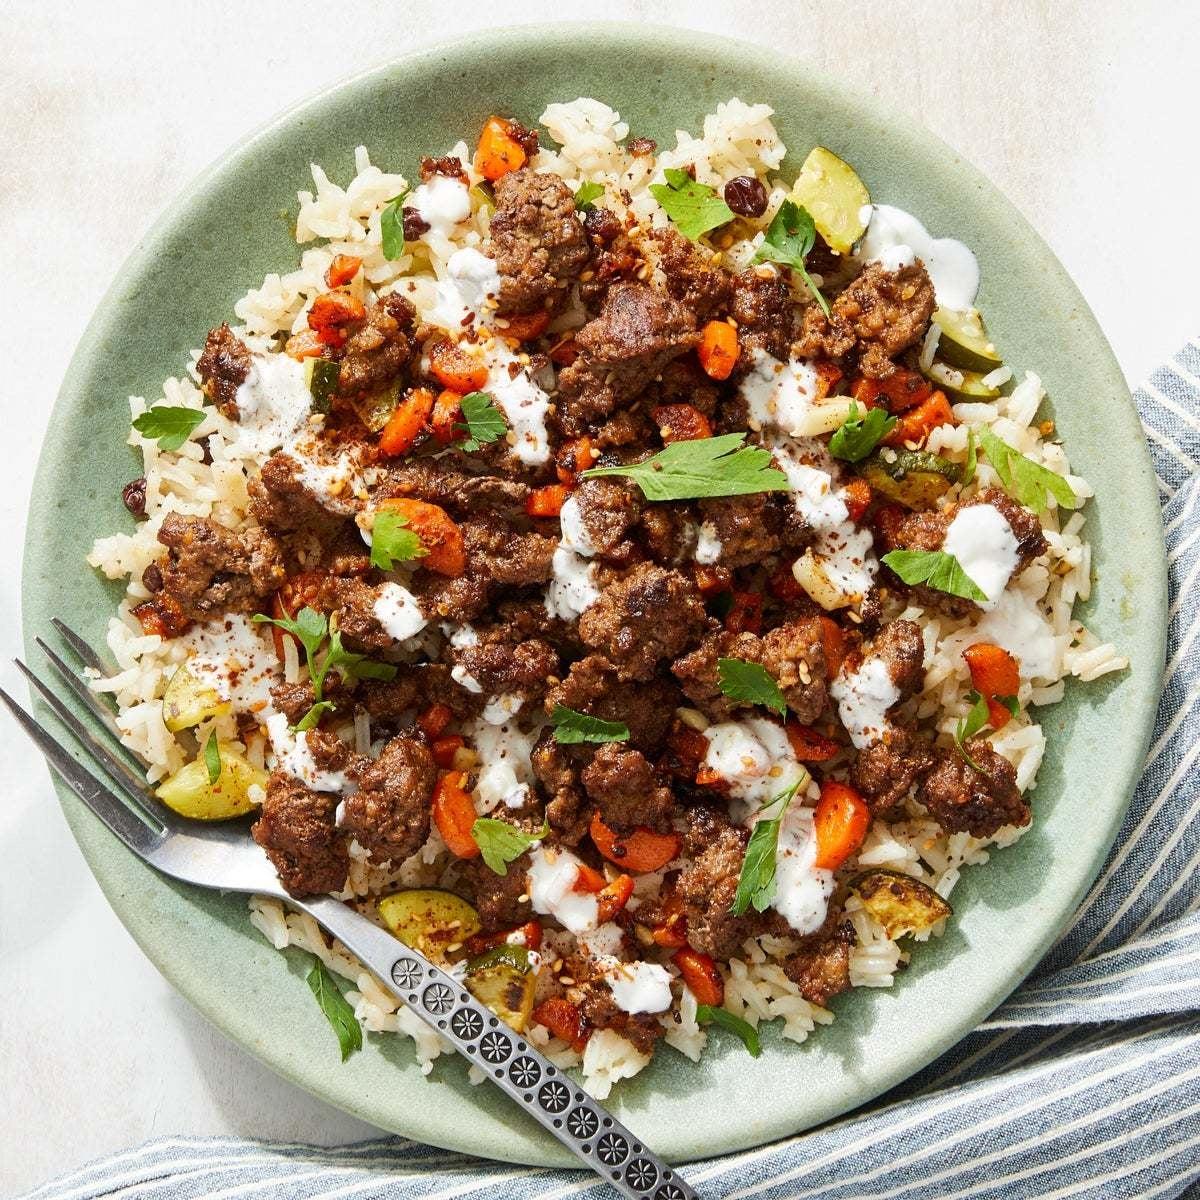 Za'atar Beef & Carrots with Zucchini Rice & Lemon Labneh